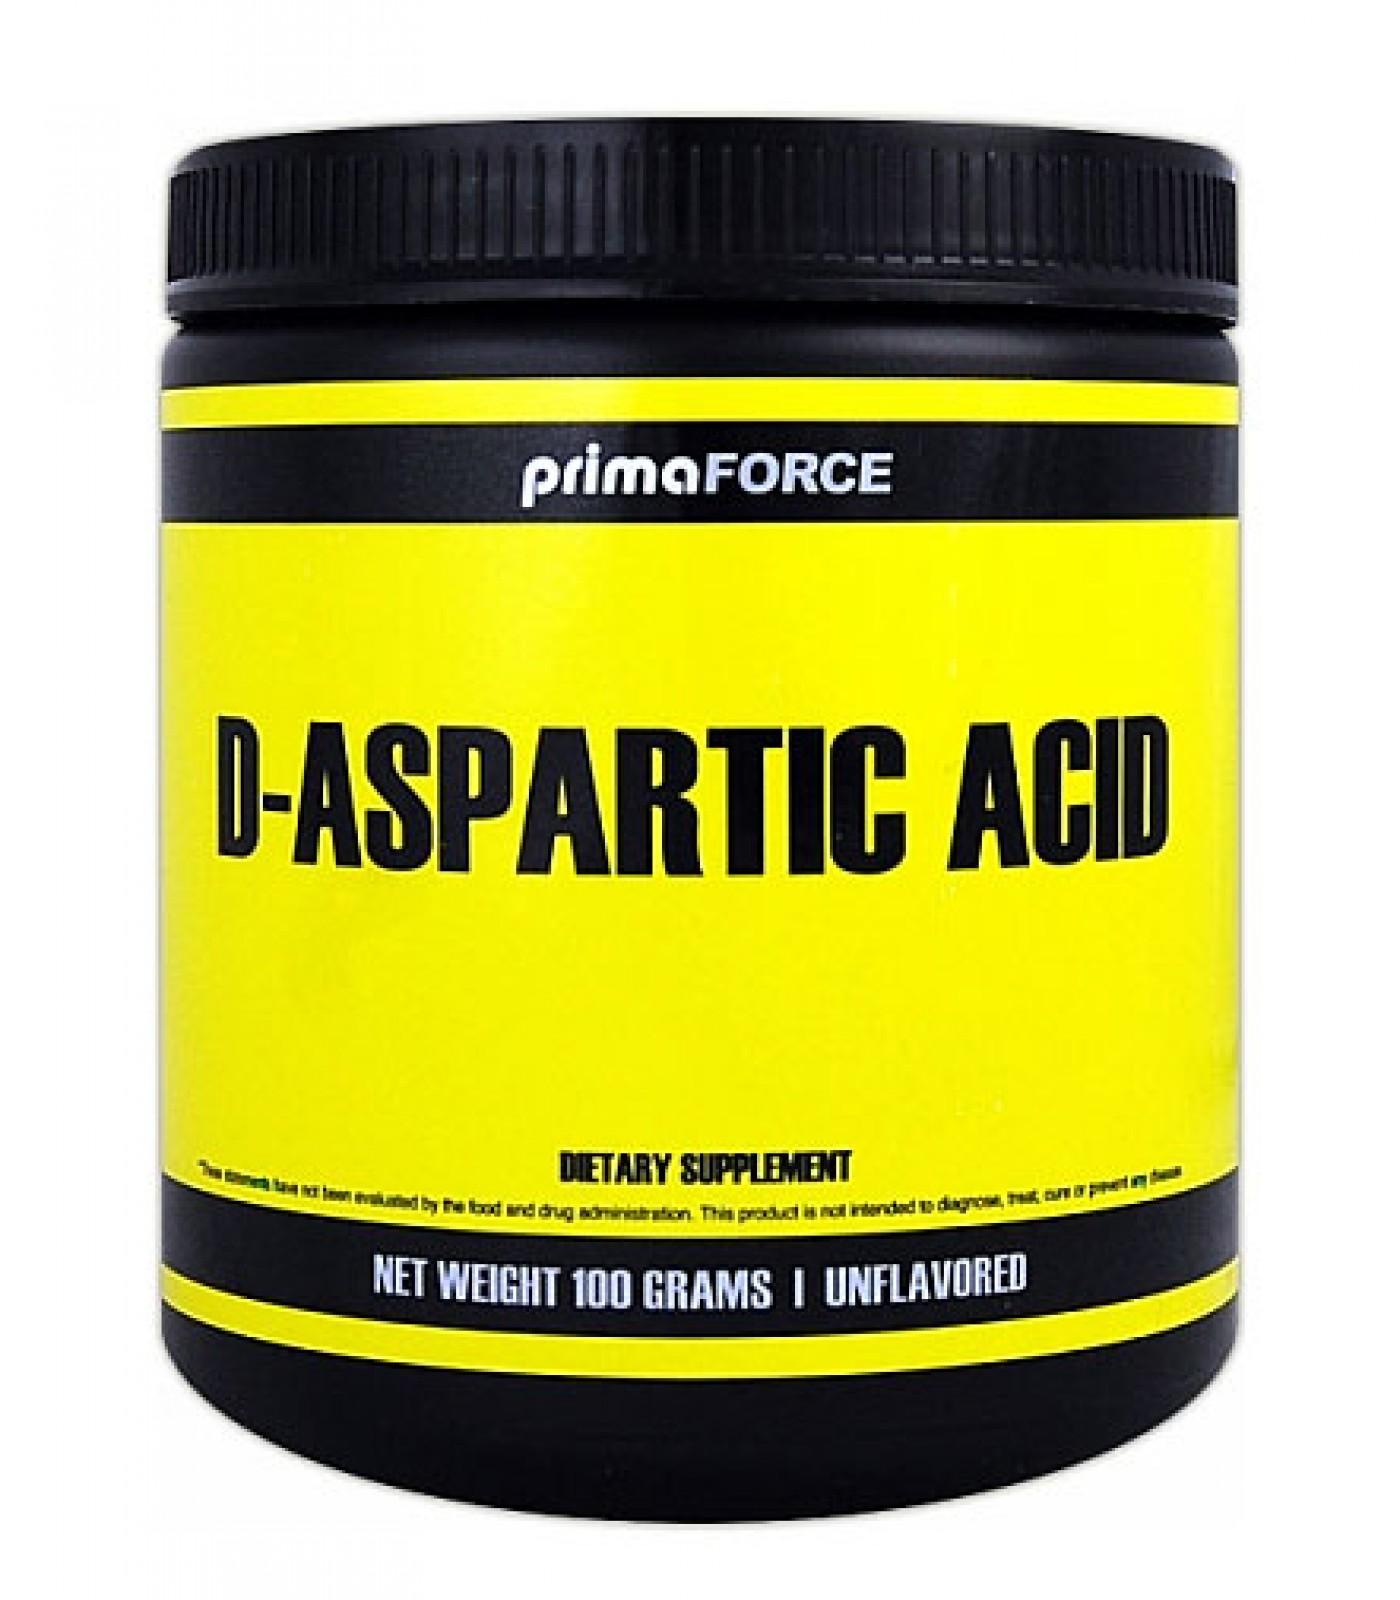 Primaforce - D-Aspartic Acid / 100 gr